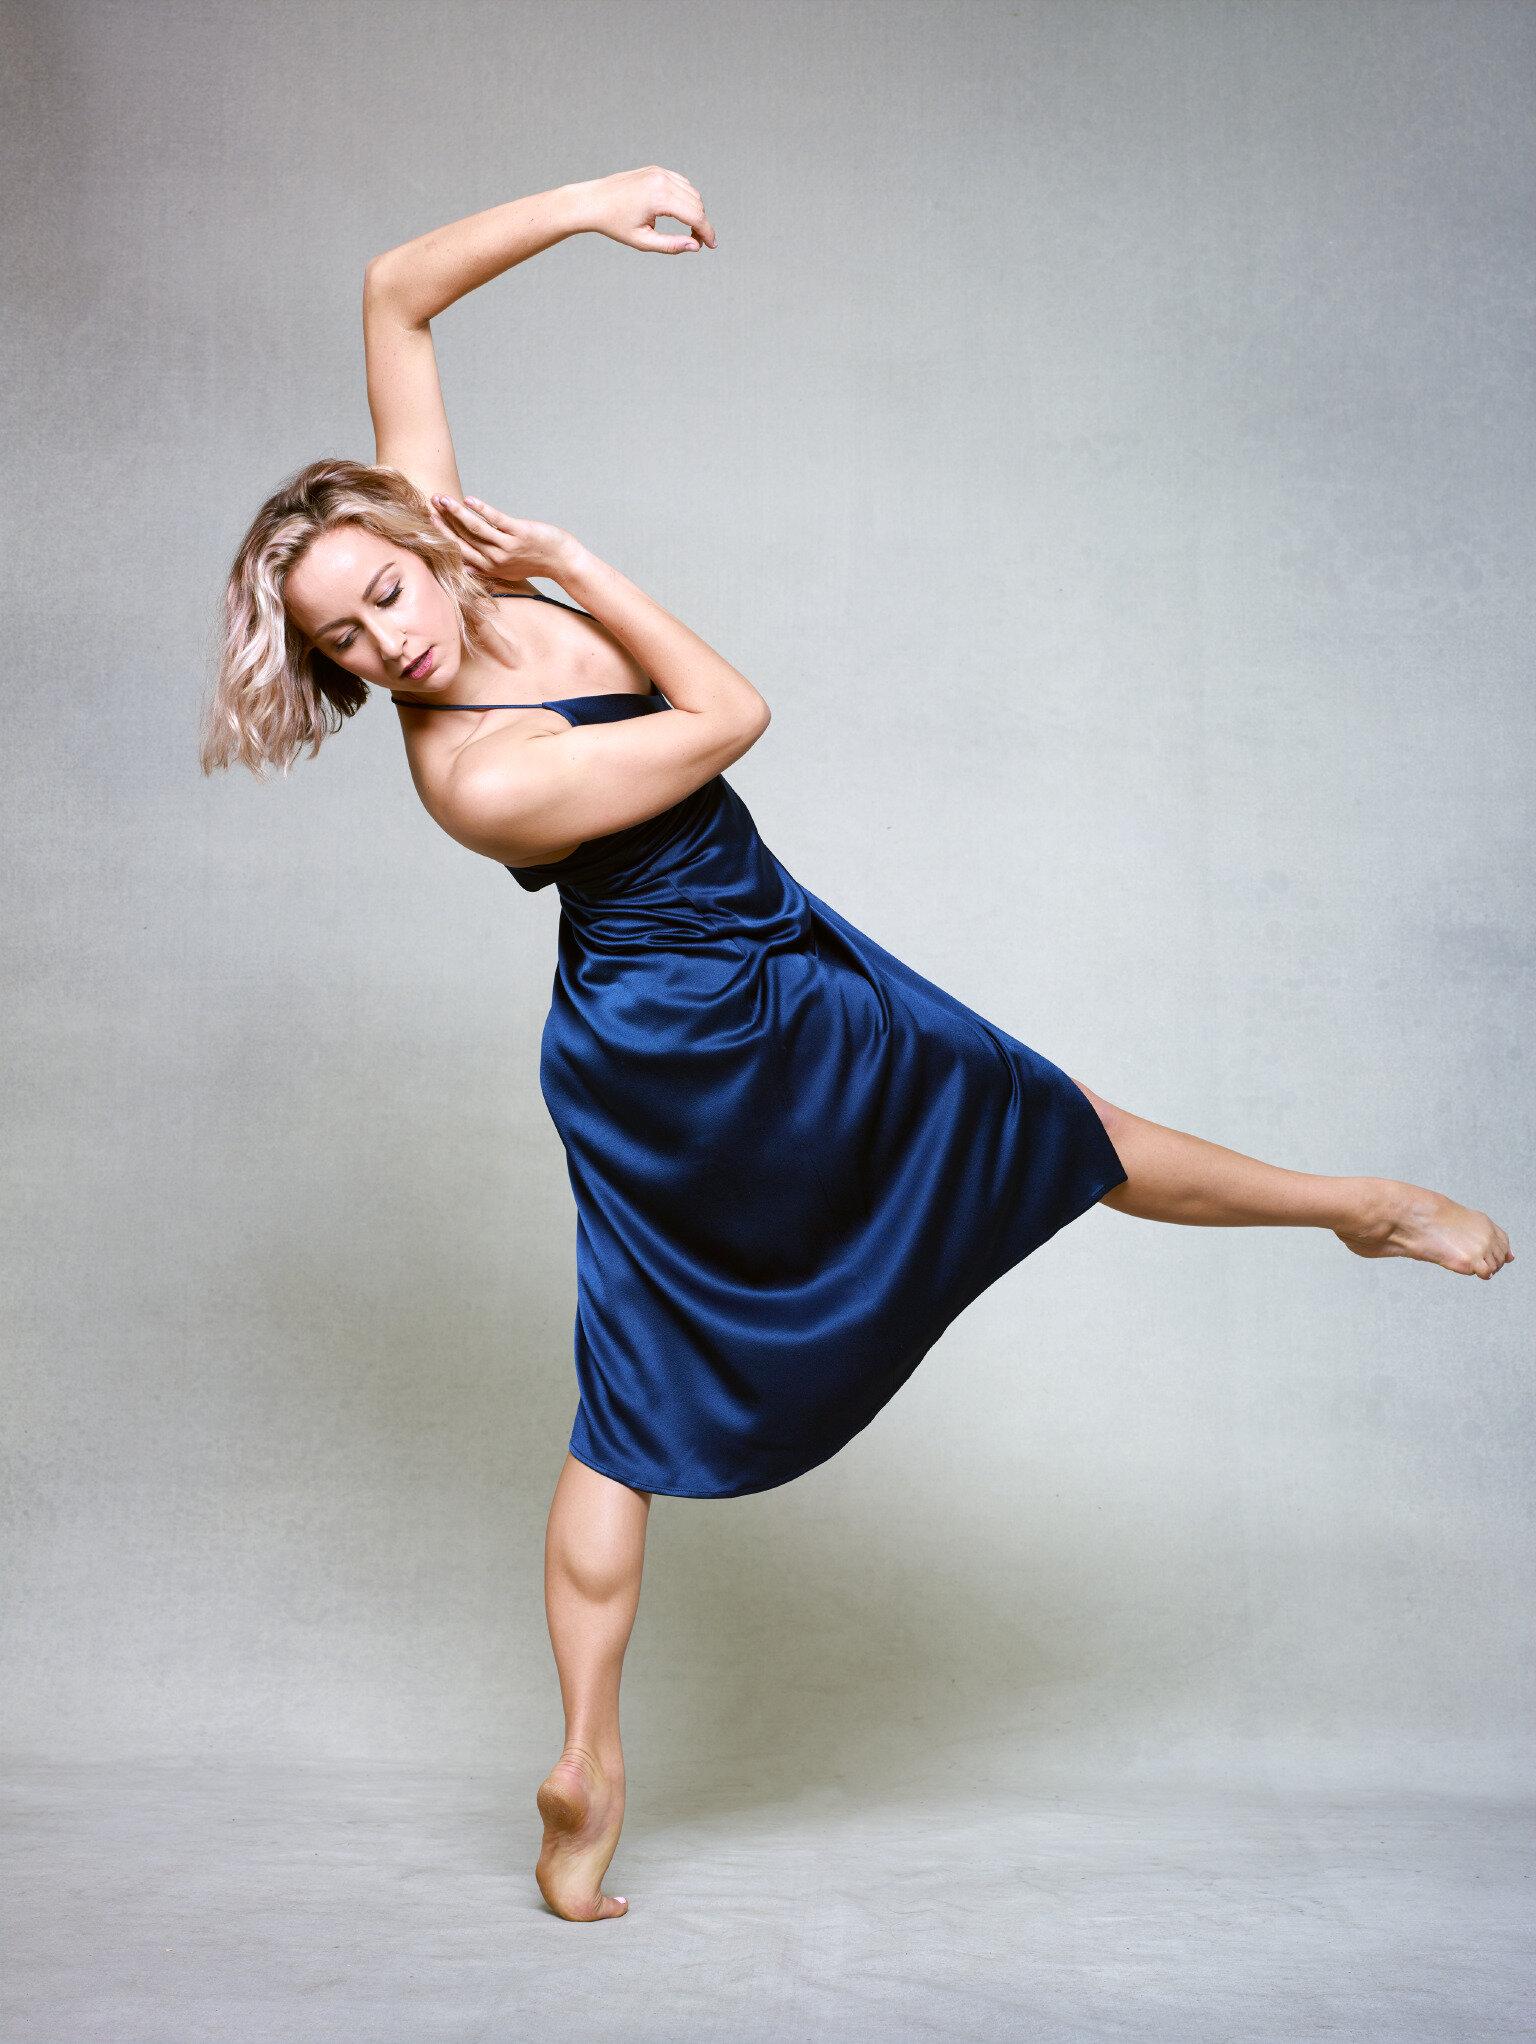 Natalie Leibert,Hubbard Street Dance Chicago and Bodytraffic in LA